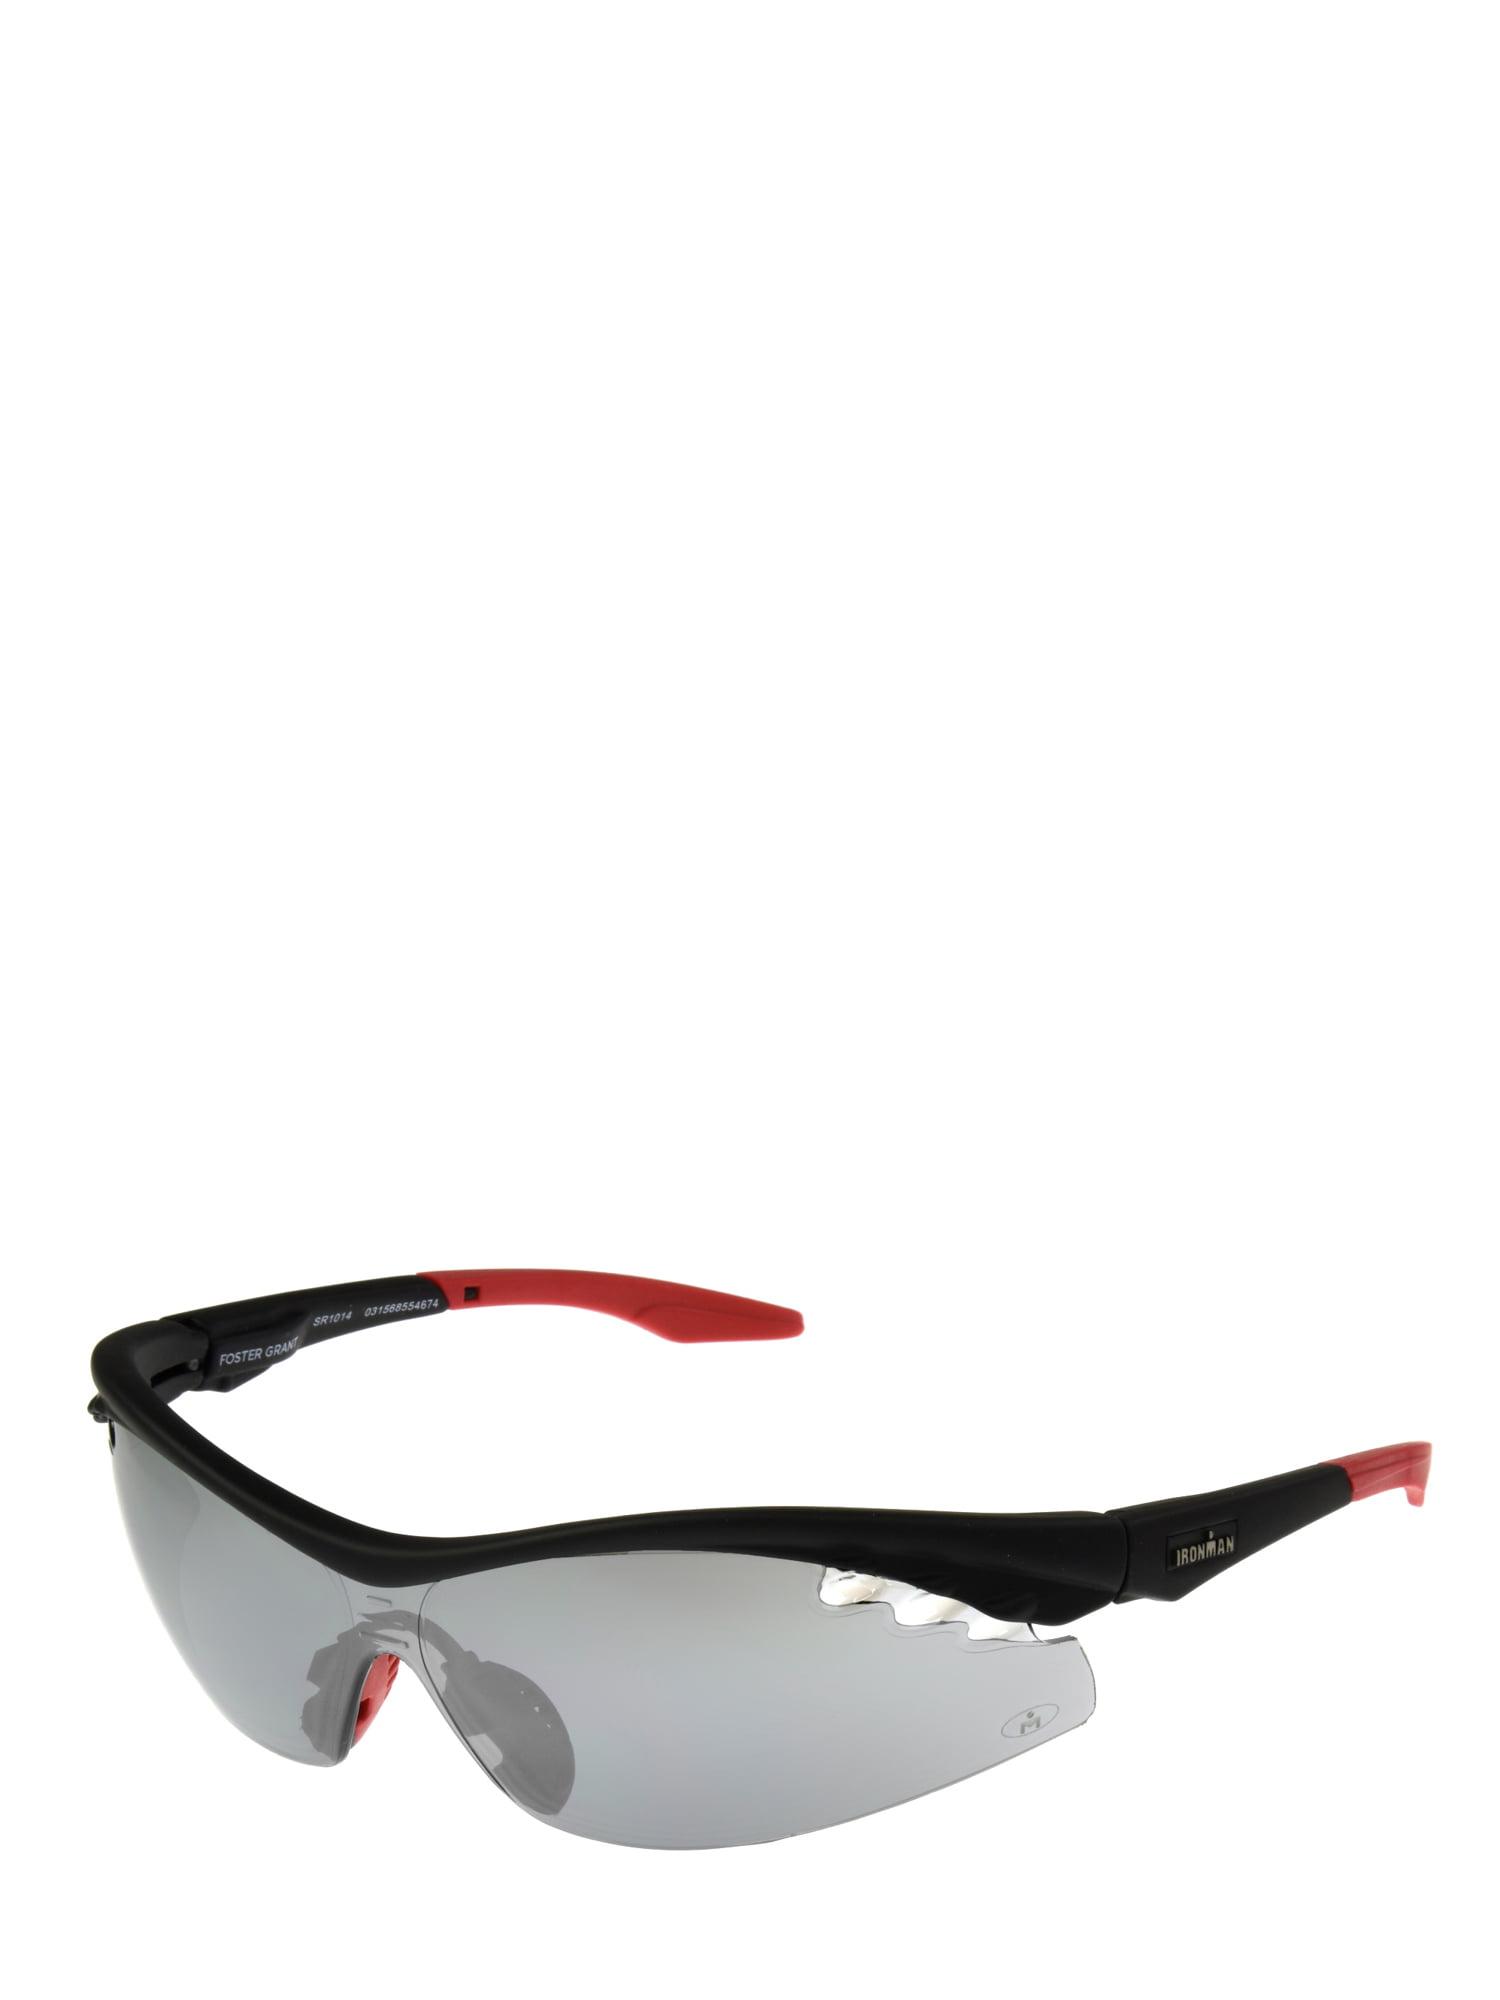 7fcd092891 IRONMAN® Shield 1 Mens Sunglasses – Walmart Inventory Checker ...